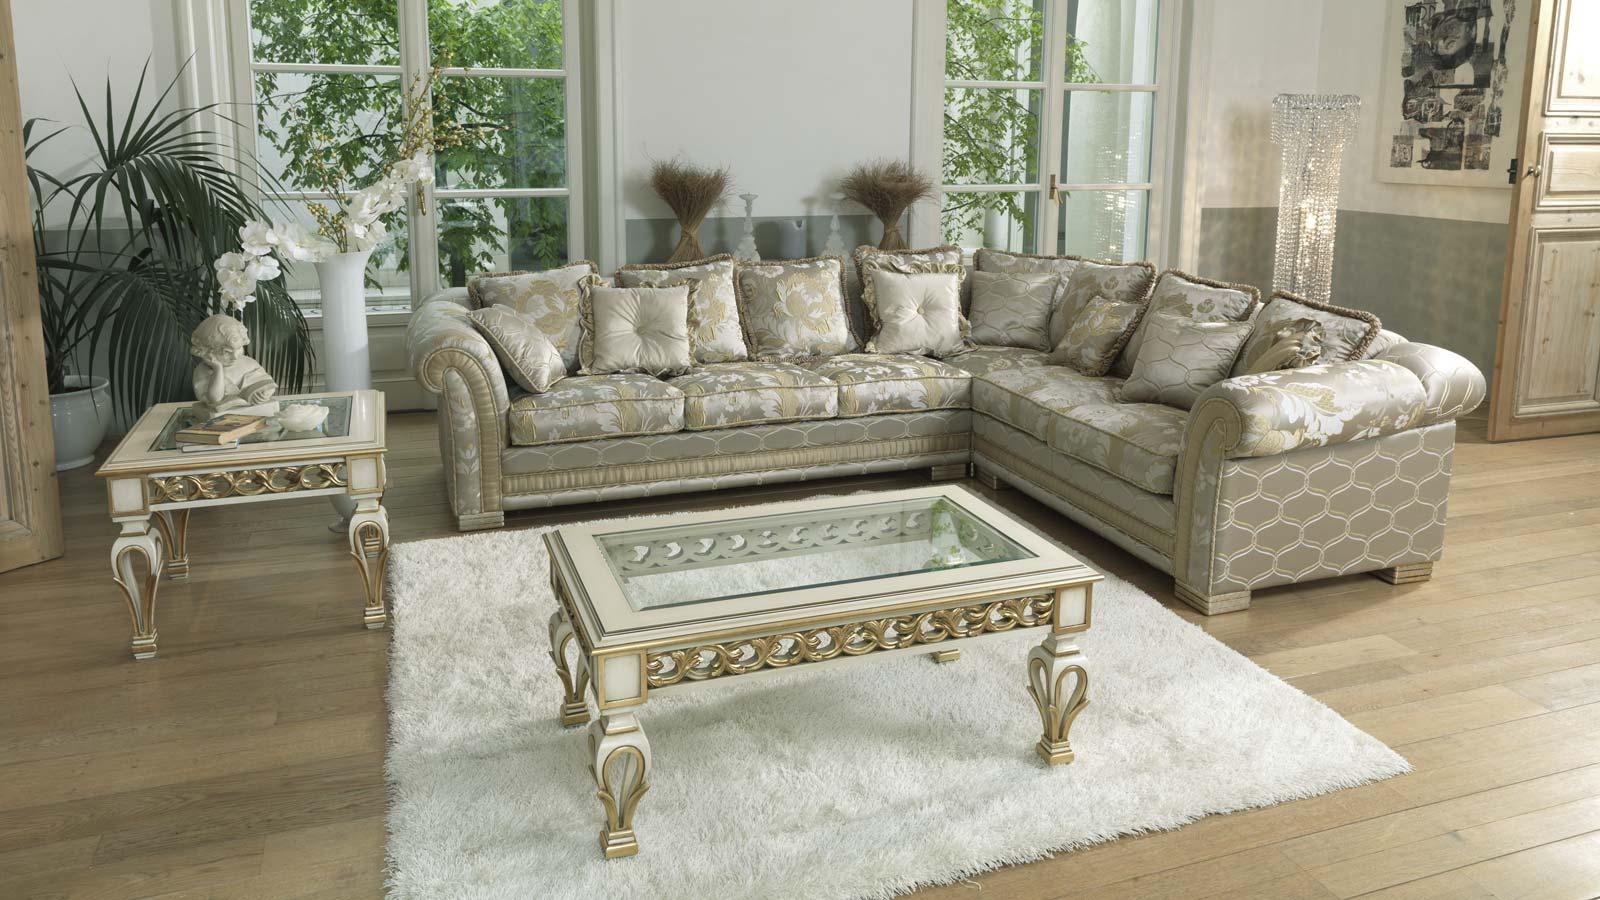 sofasworld showroom minotti sofa price dress womens clothing shops uk sofas leather fabric co